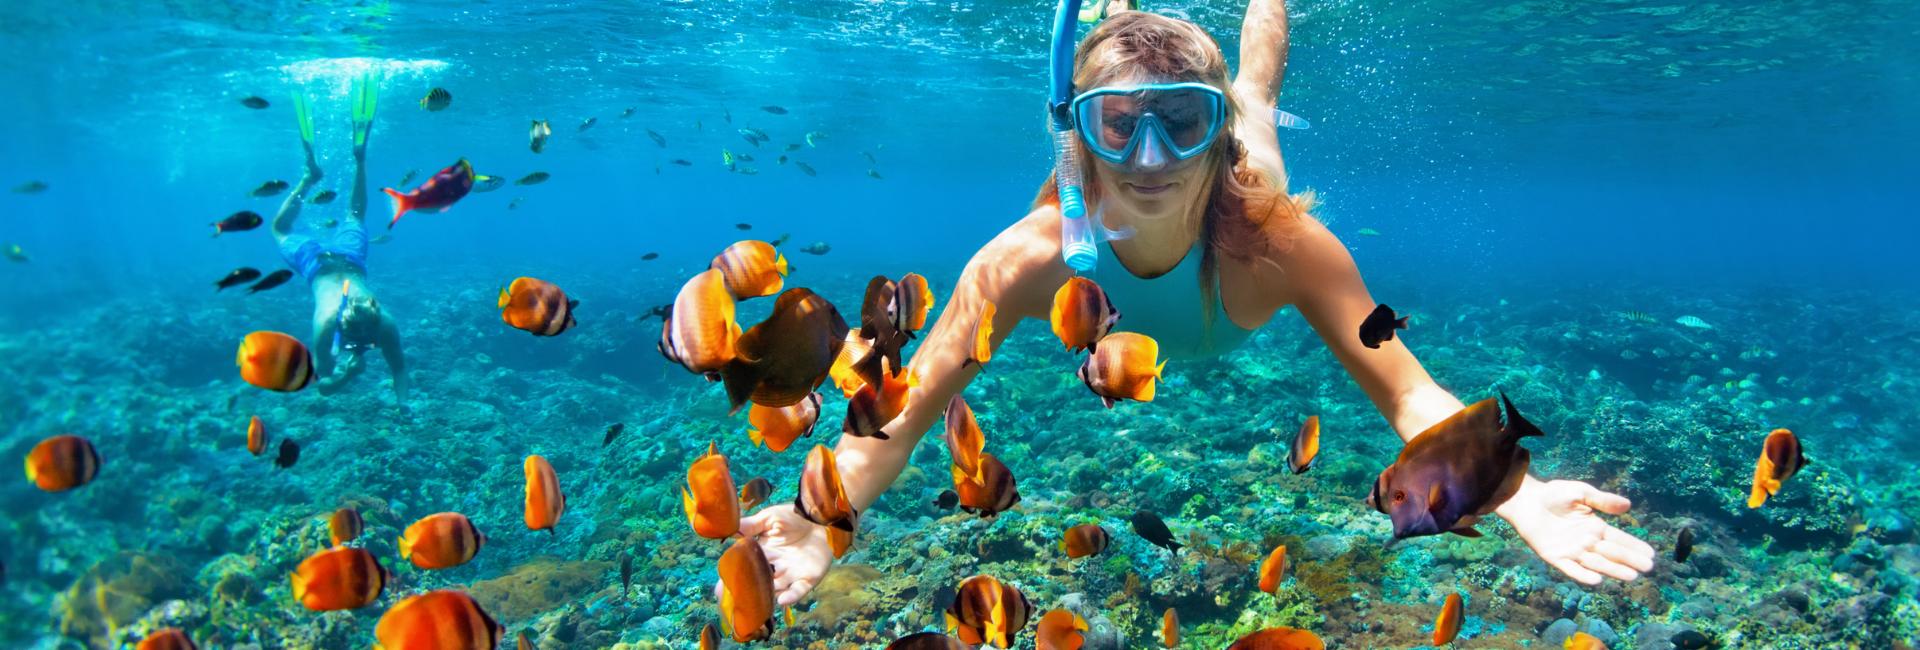 woman snorkeling through orange fish in hawaii